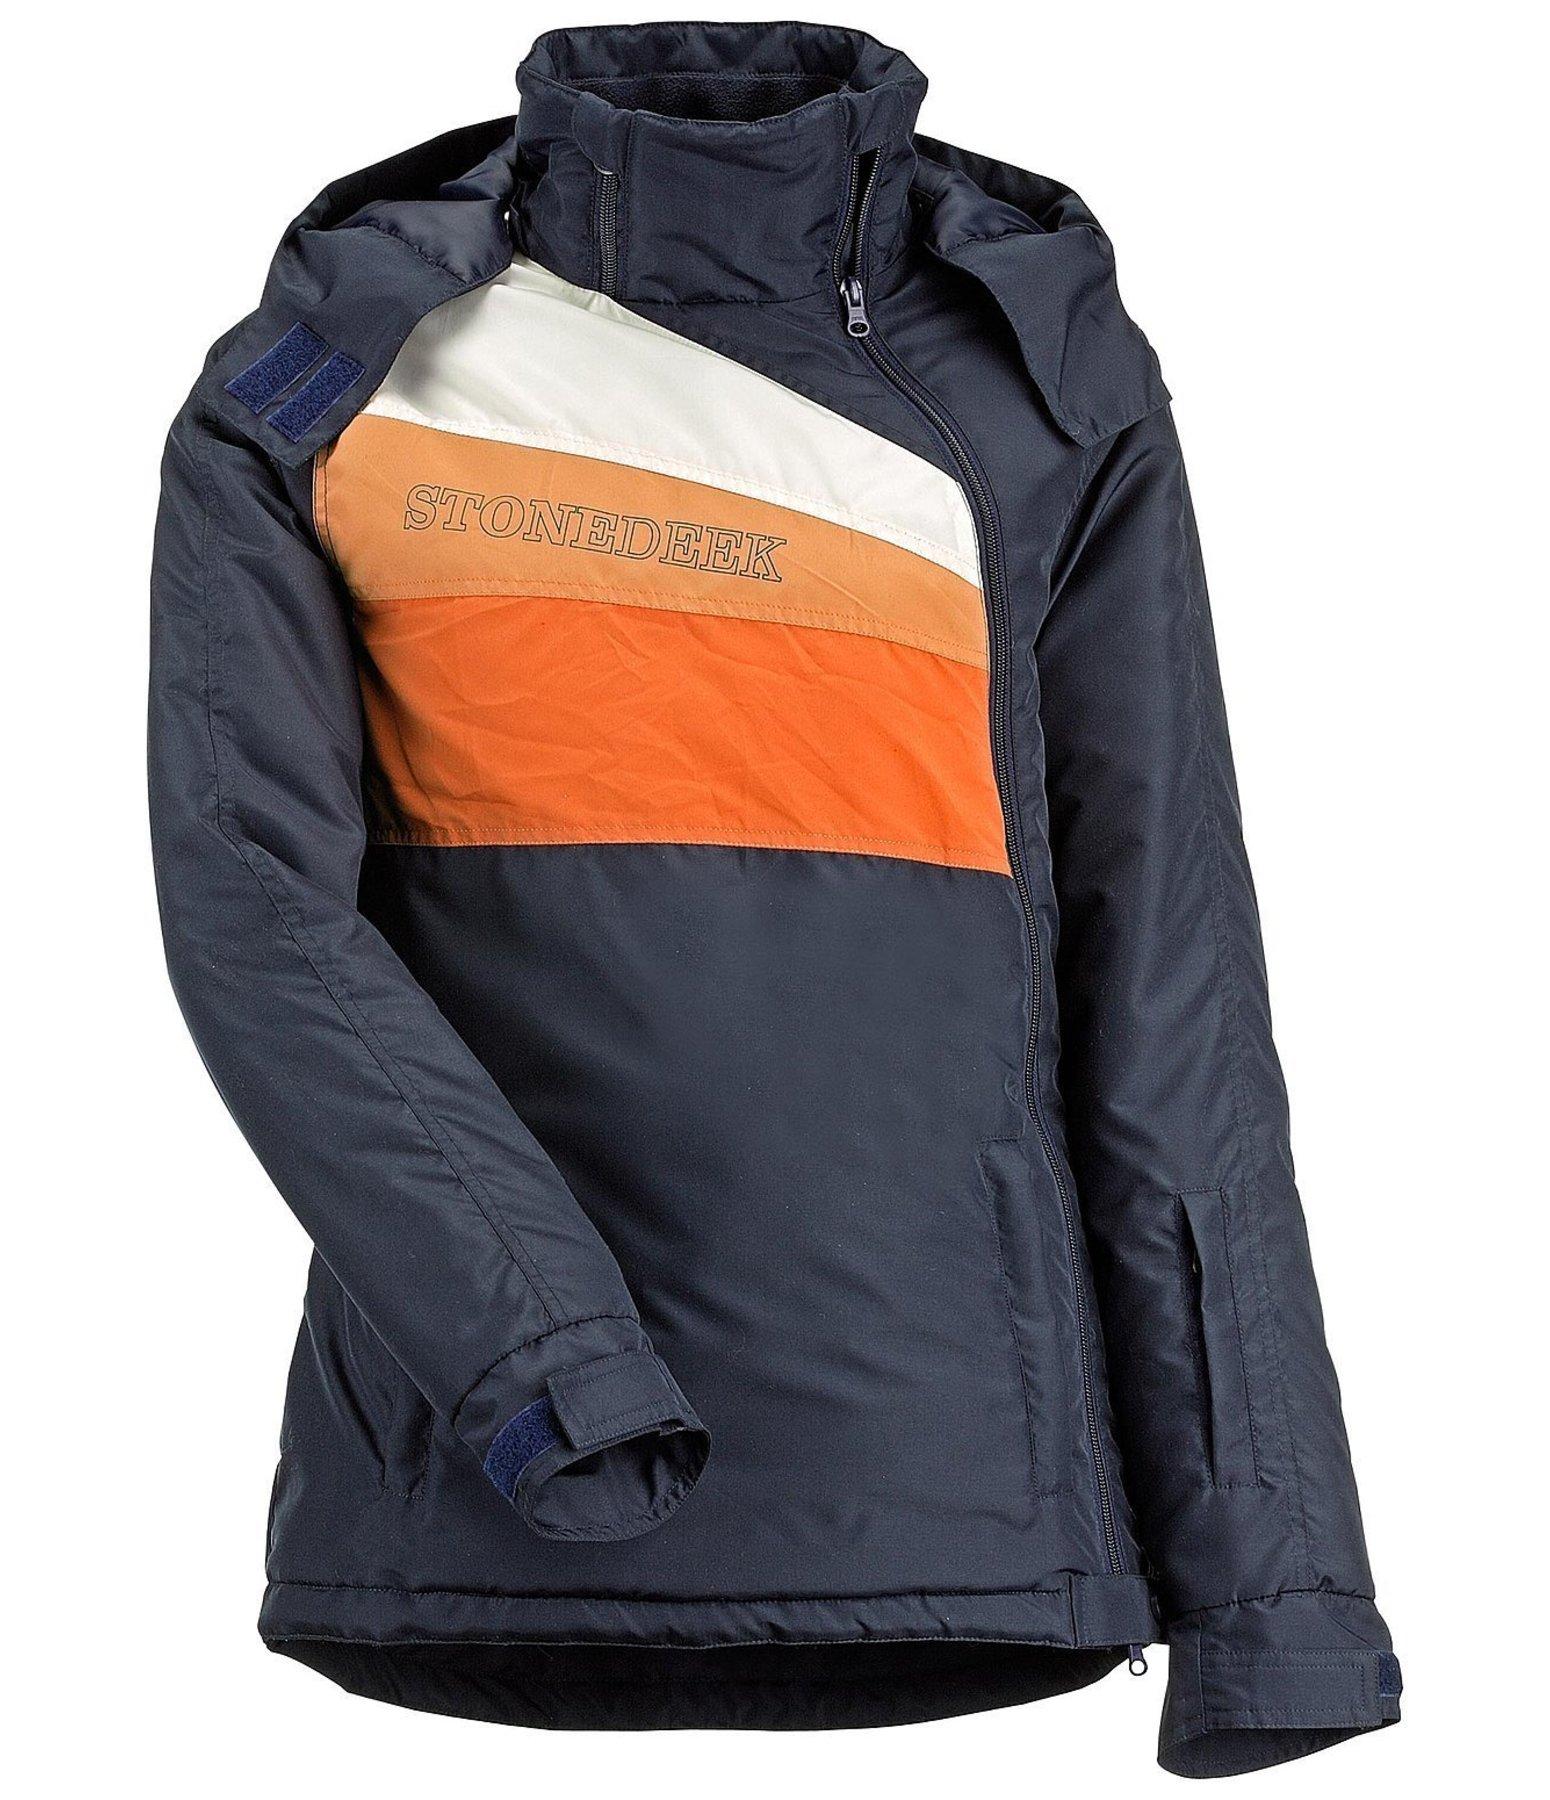 veste imperm able trail vestes blousons et gilets pour femme kramer equitation. Black Bedroom Furniture Sets. Home Design Ideas